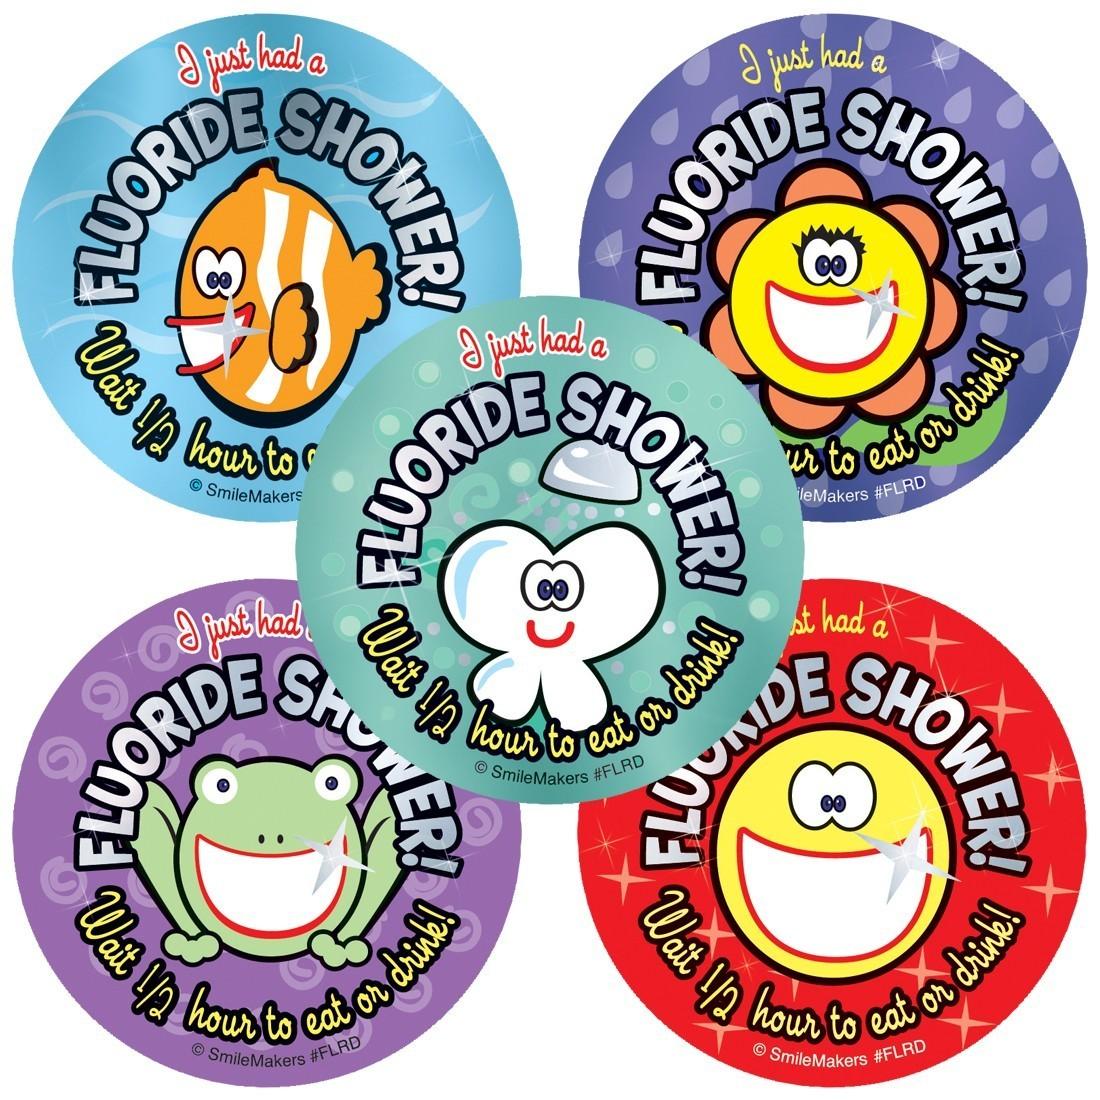 Foil Fluoride Shower Stickers                      [image]